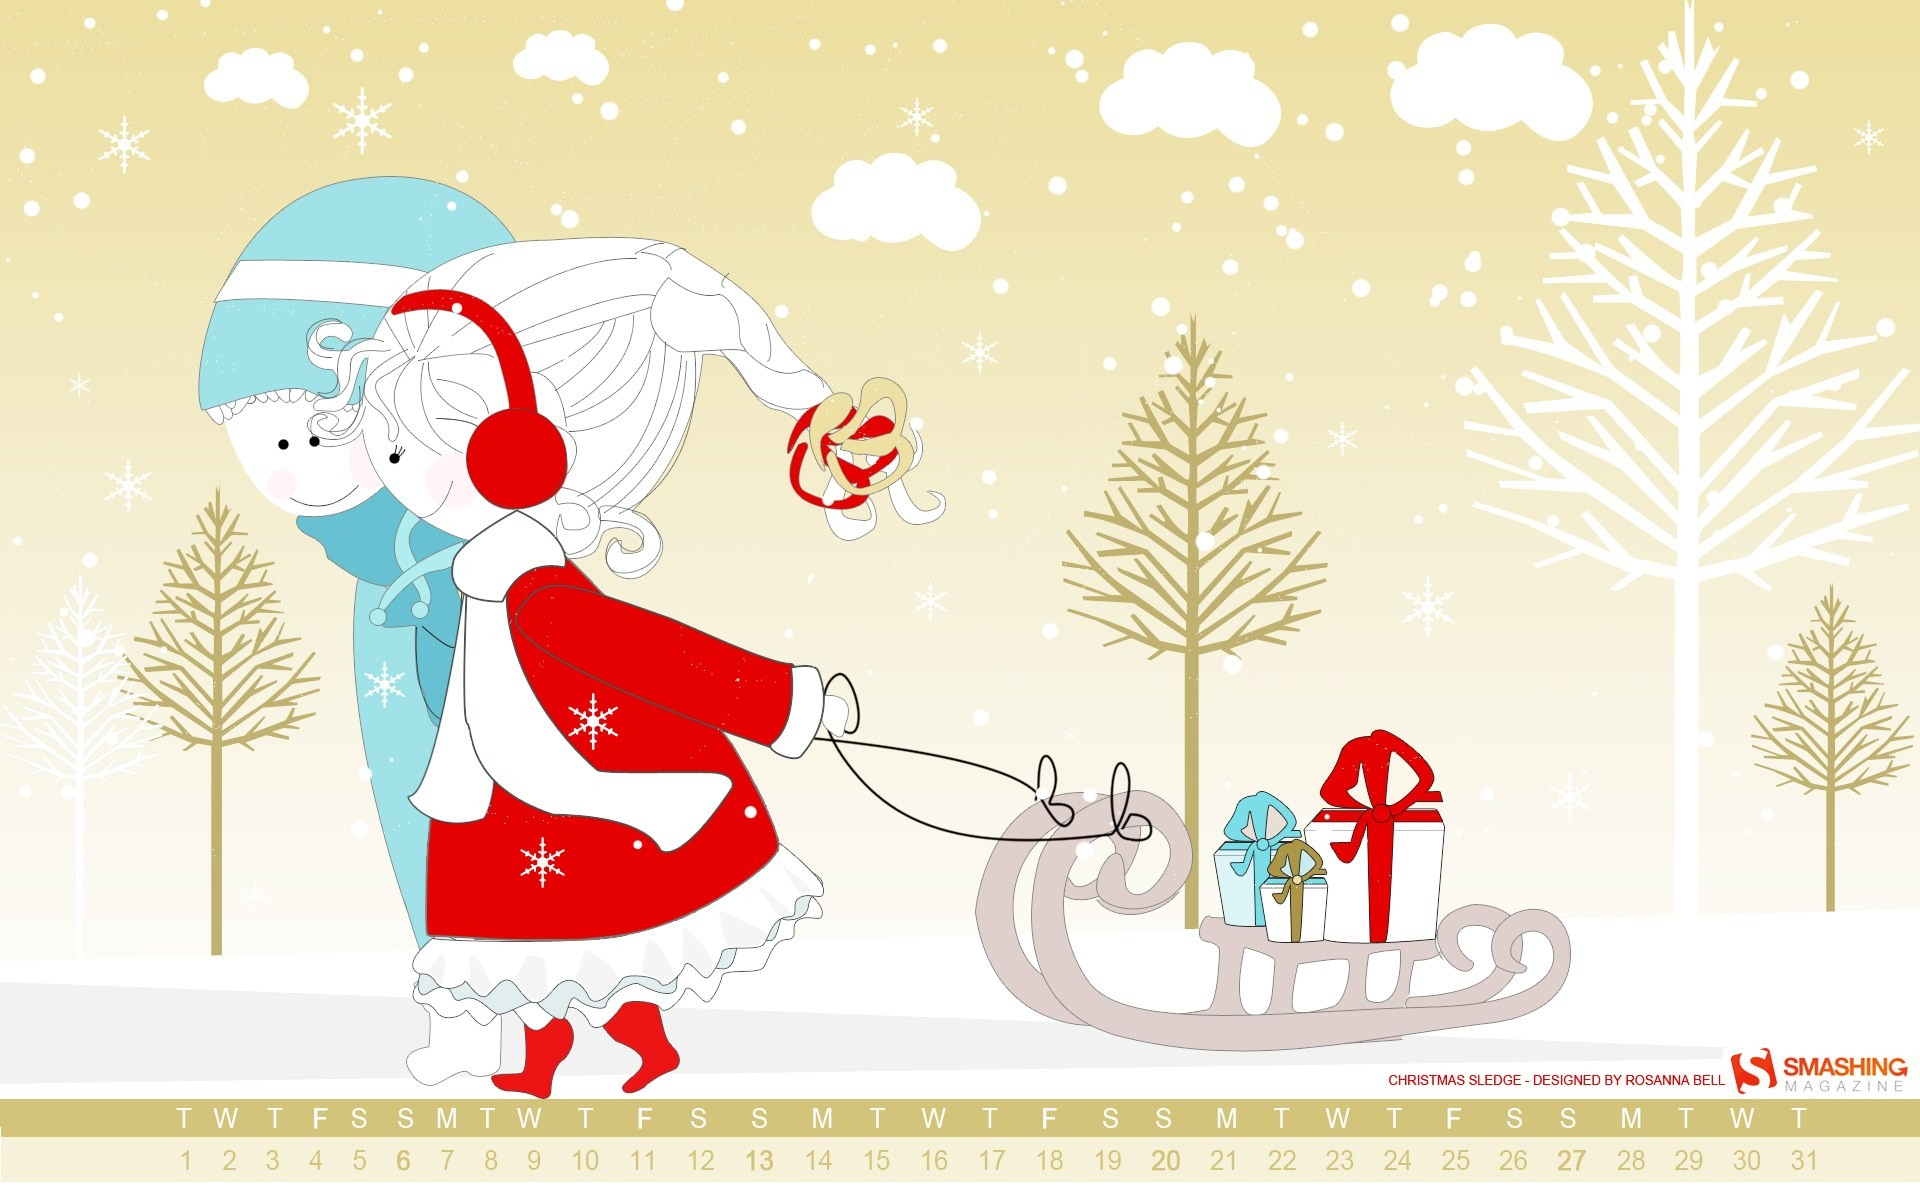 Dibujos navidad para niños - 1920x1200